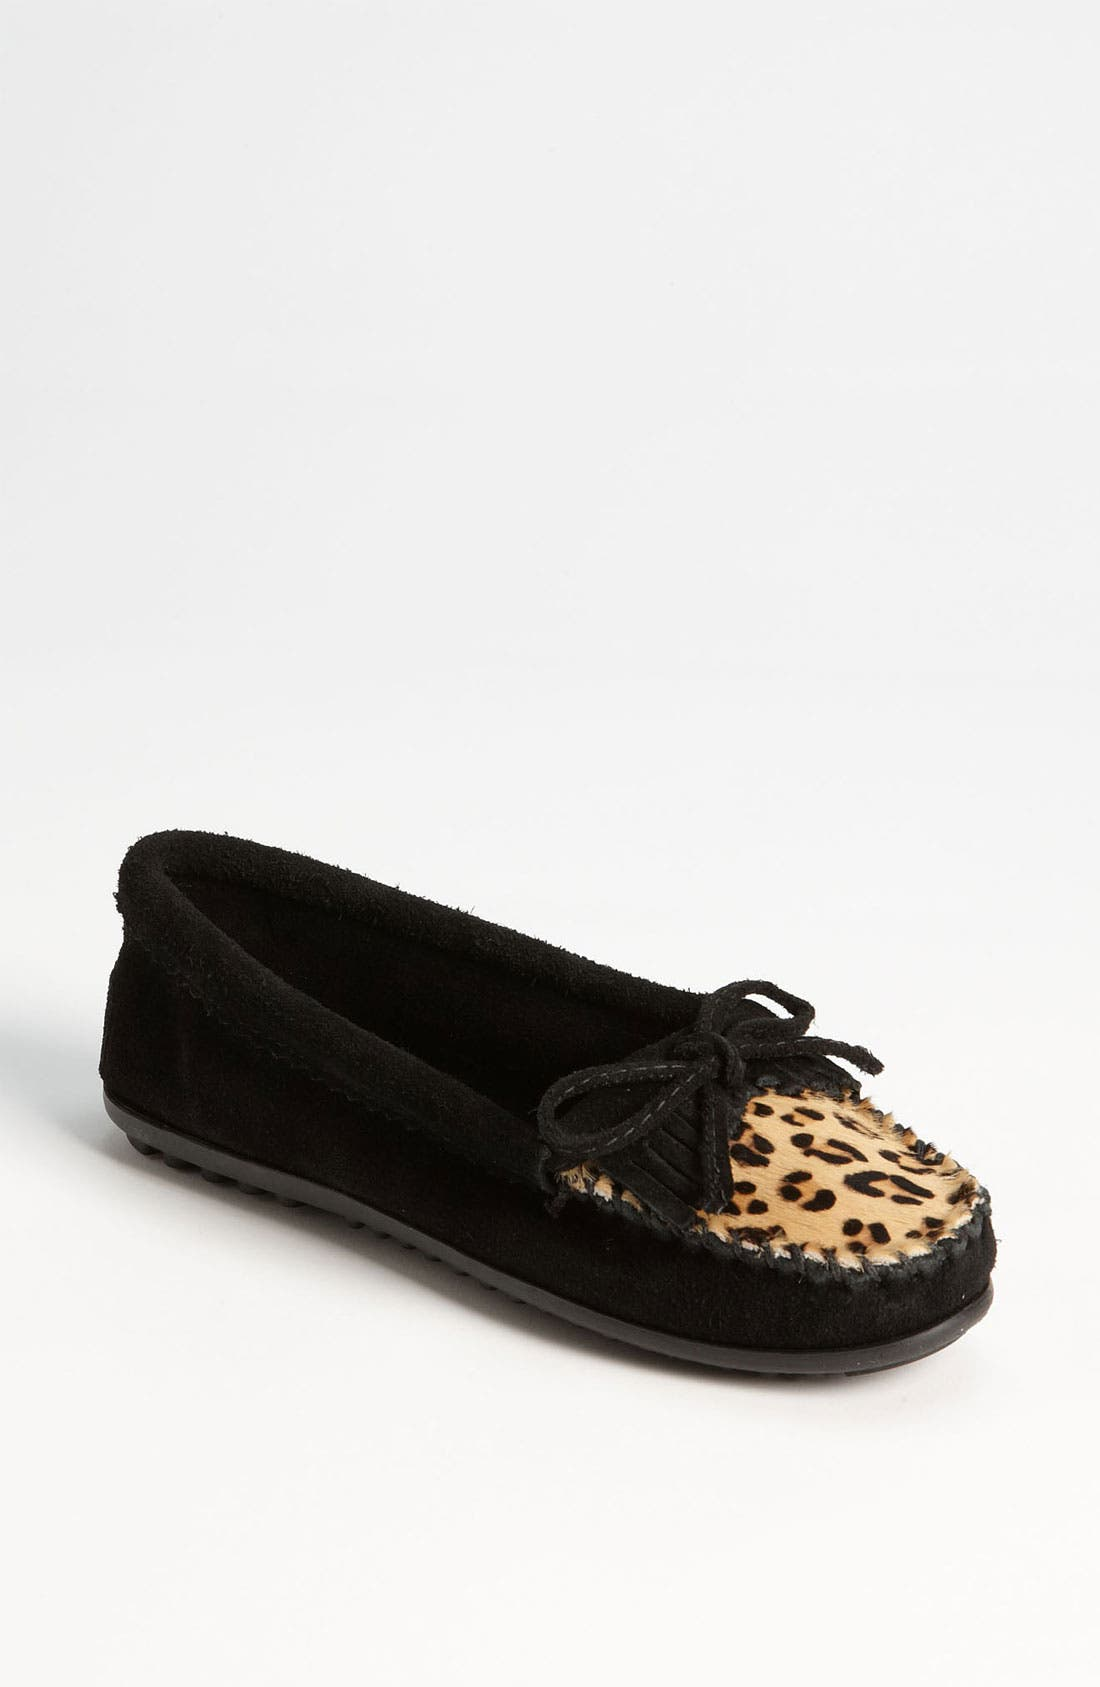 MINNETONKA 'Leopard Kilty' Moccasin, Main, color, 001